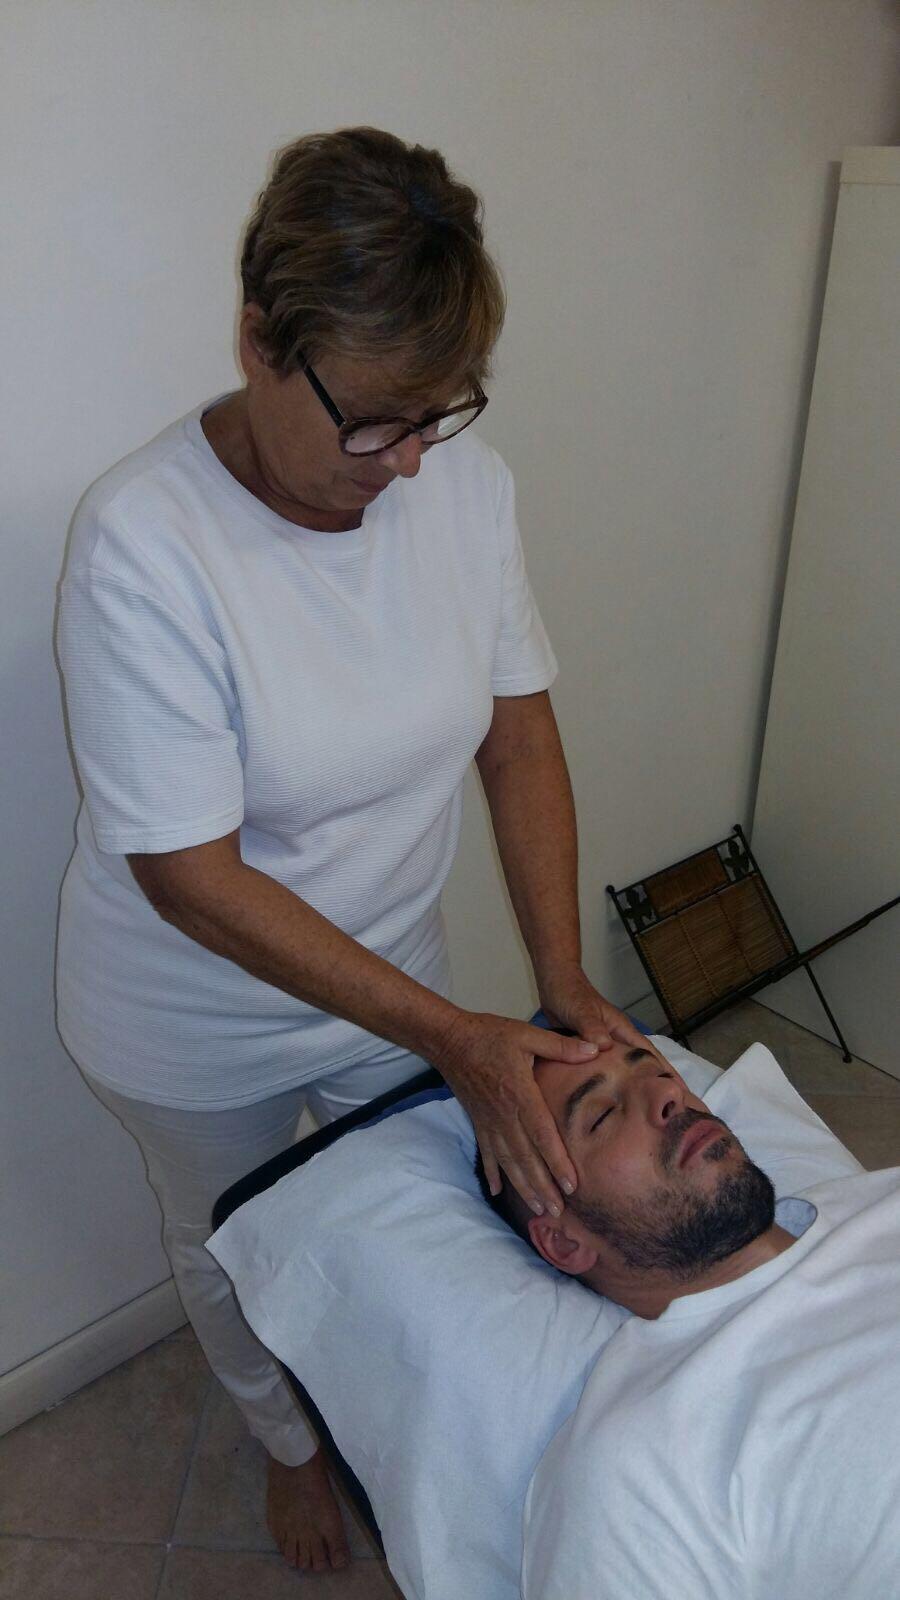 Sandra Sasso Shiatsu practitioner, Emotional Reflexology practitioner and Reiki practitioner in Kelowna, Canada